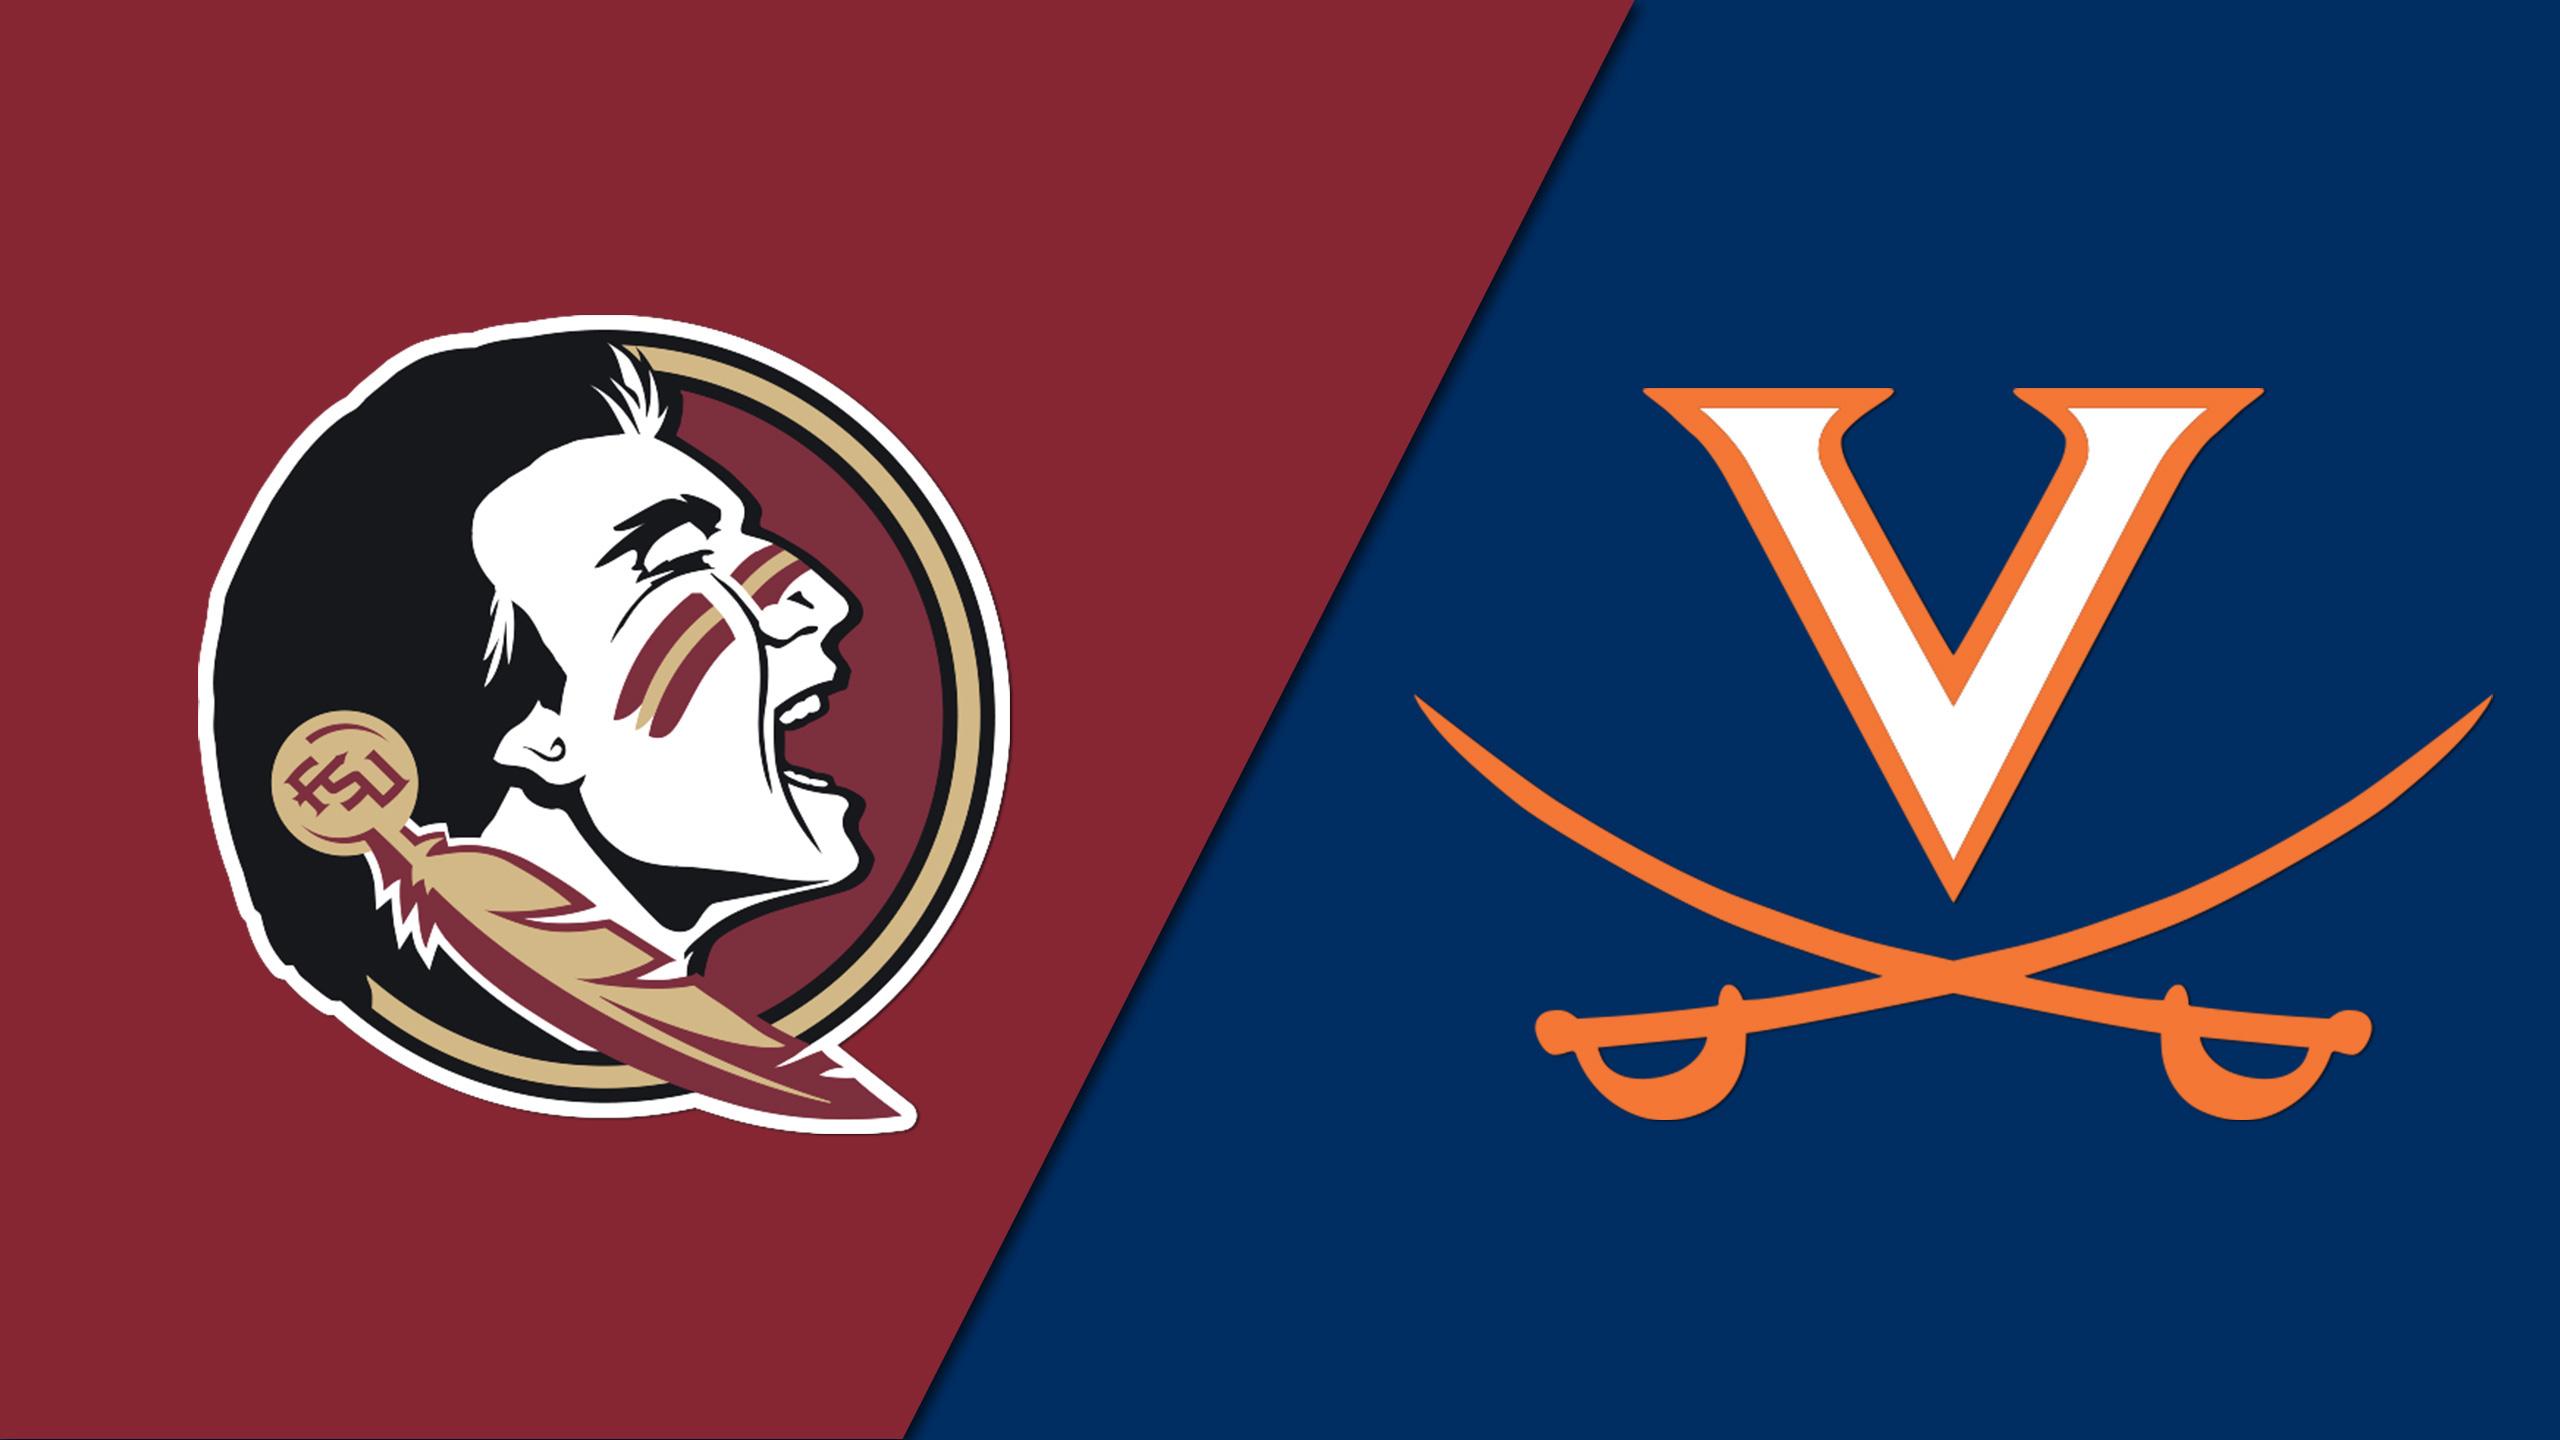 #7 Florida State vs. #11 Virginia (Semifinal) (ACC Women's Soccer Championship)